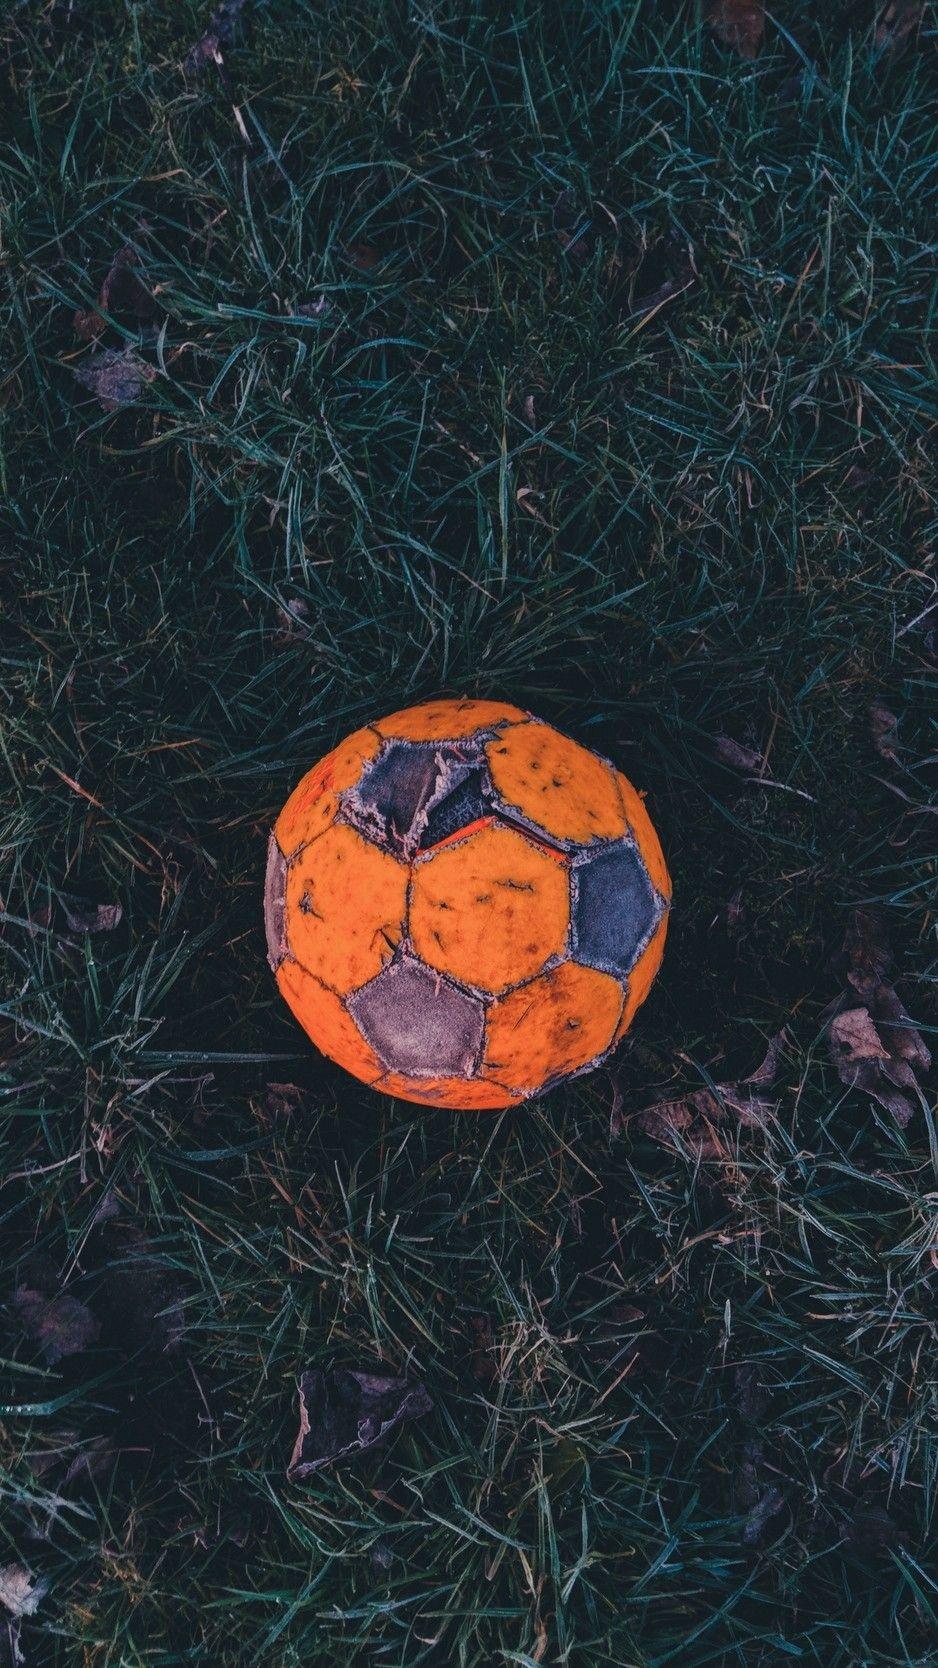 Football Iphone Wallpaper Gambar Sepak Bola Seni Gelap Pemain Sepak Bola